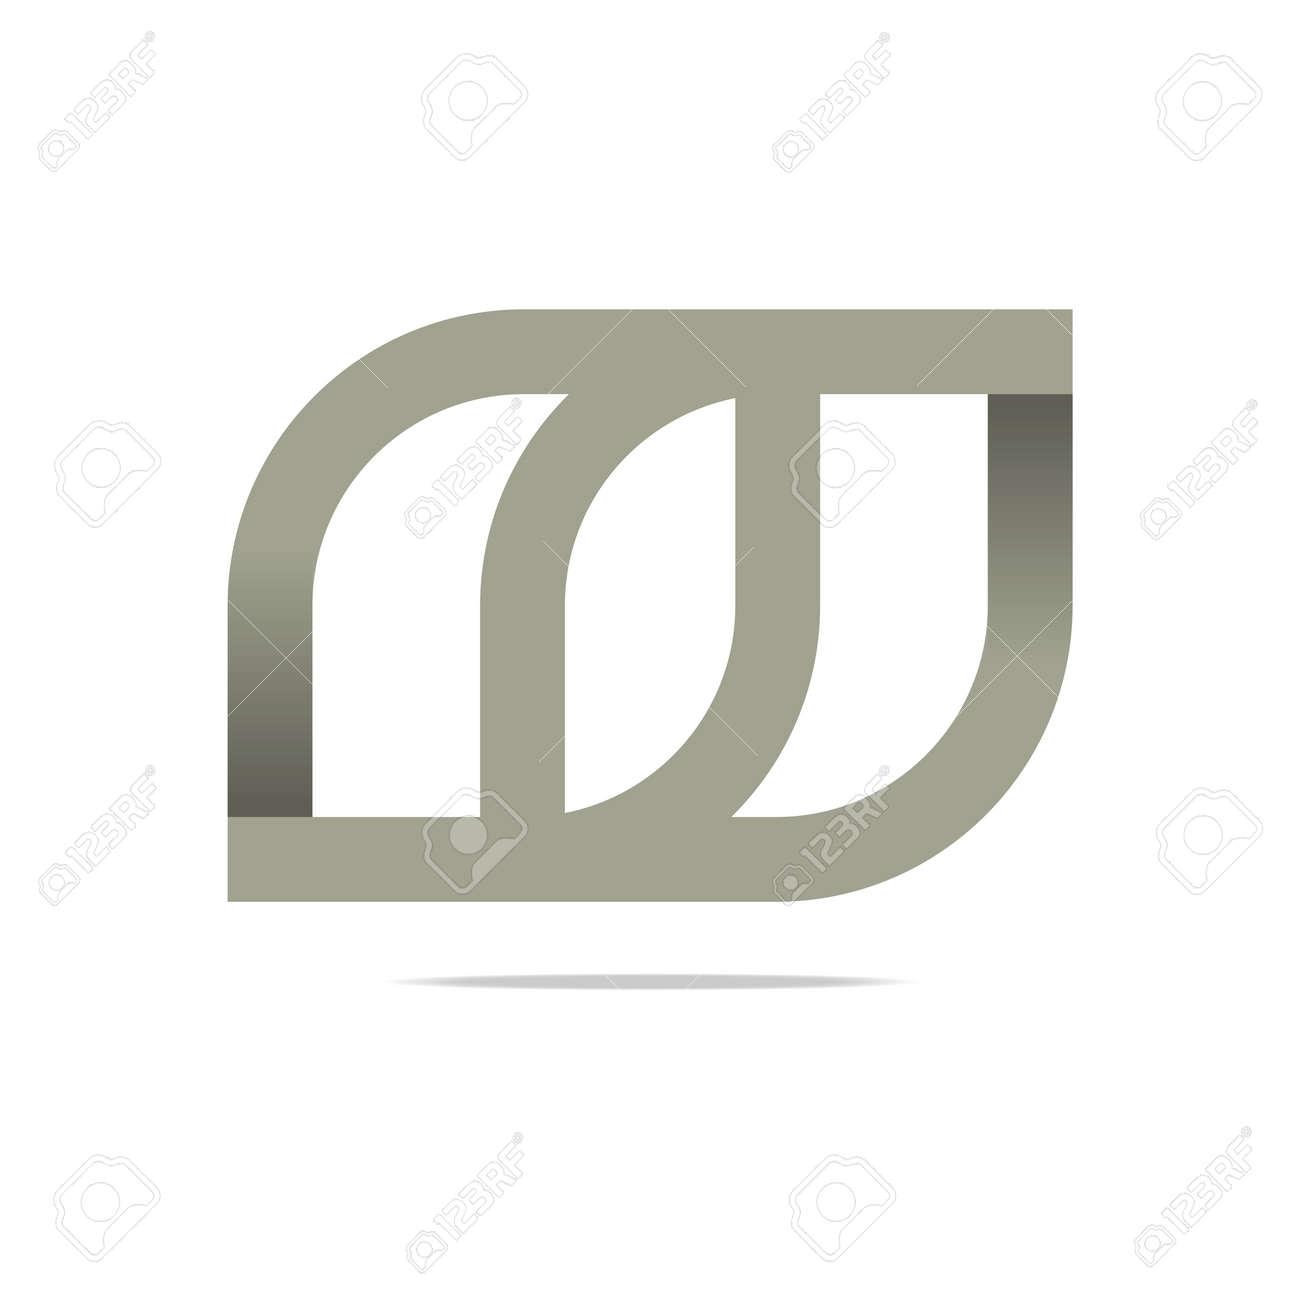 Logo design element company name bussines letter symbol icon logo design element company name bussines letter symbol icon stock vector 45283864 buycottarizona